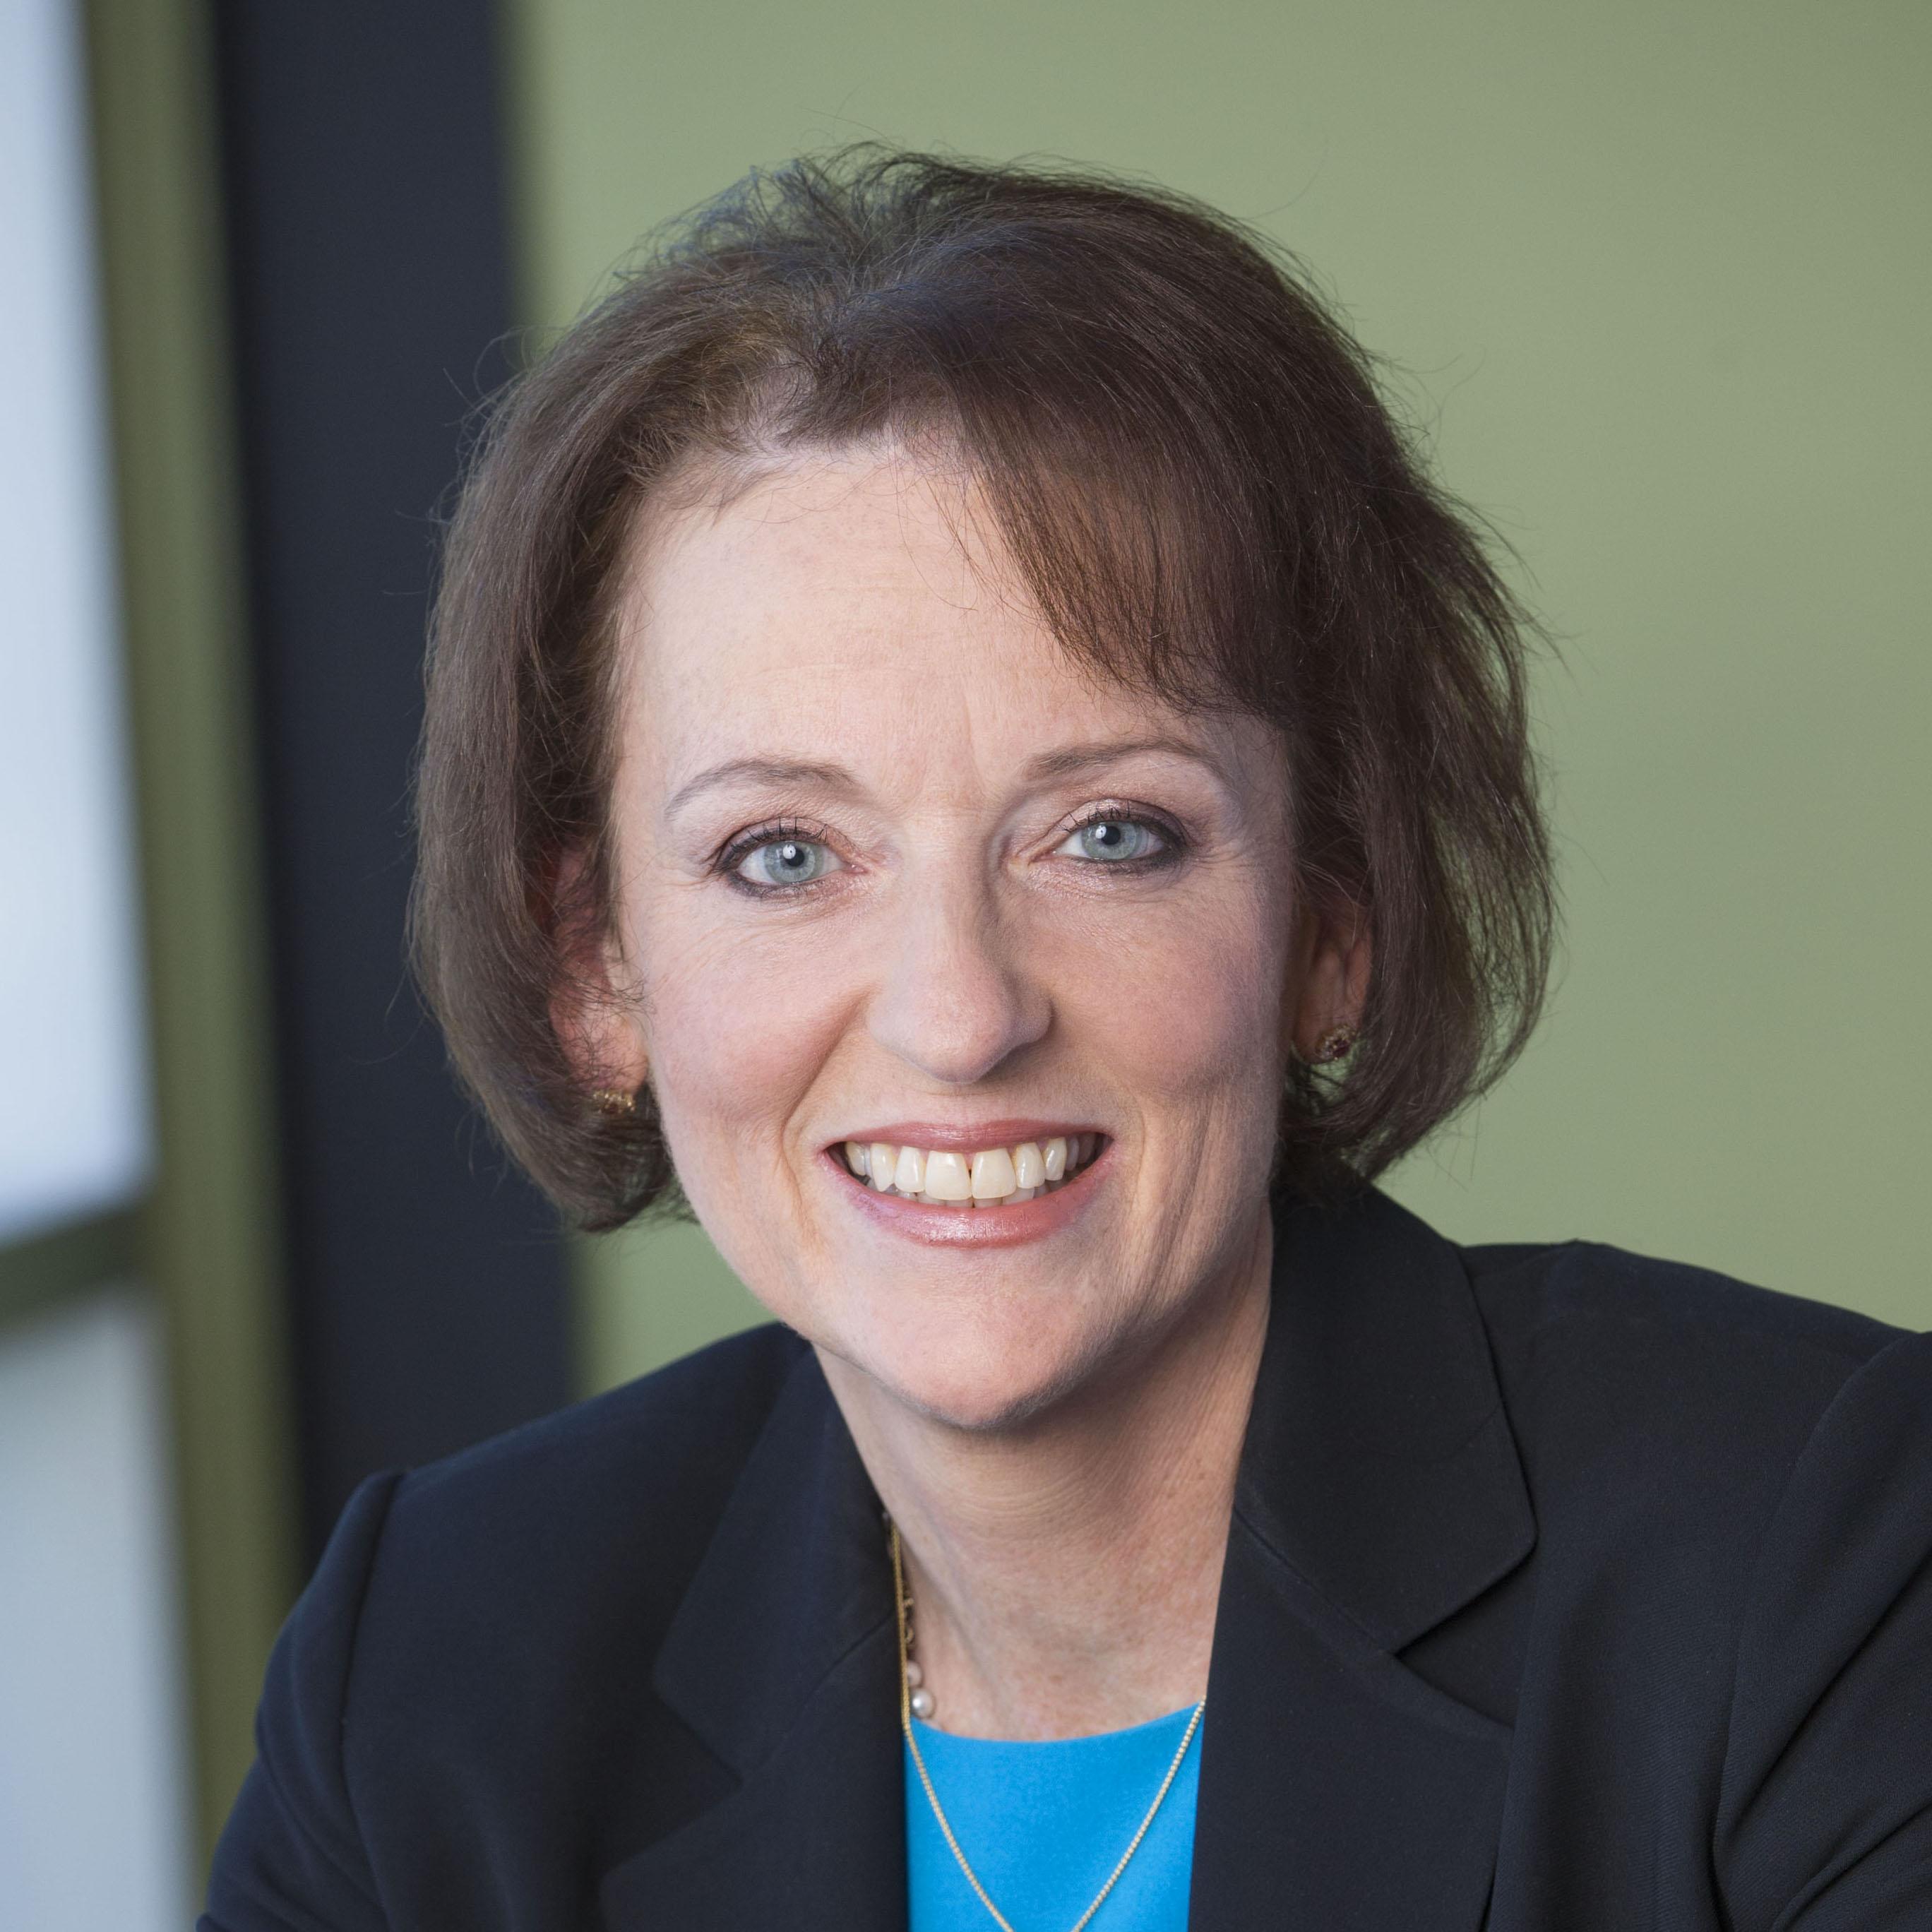 Dr. Barbara J. Burger